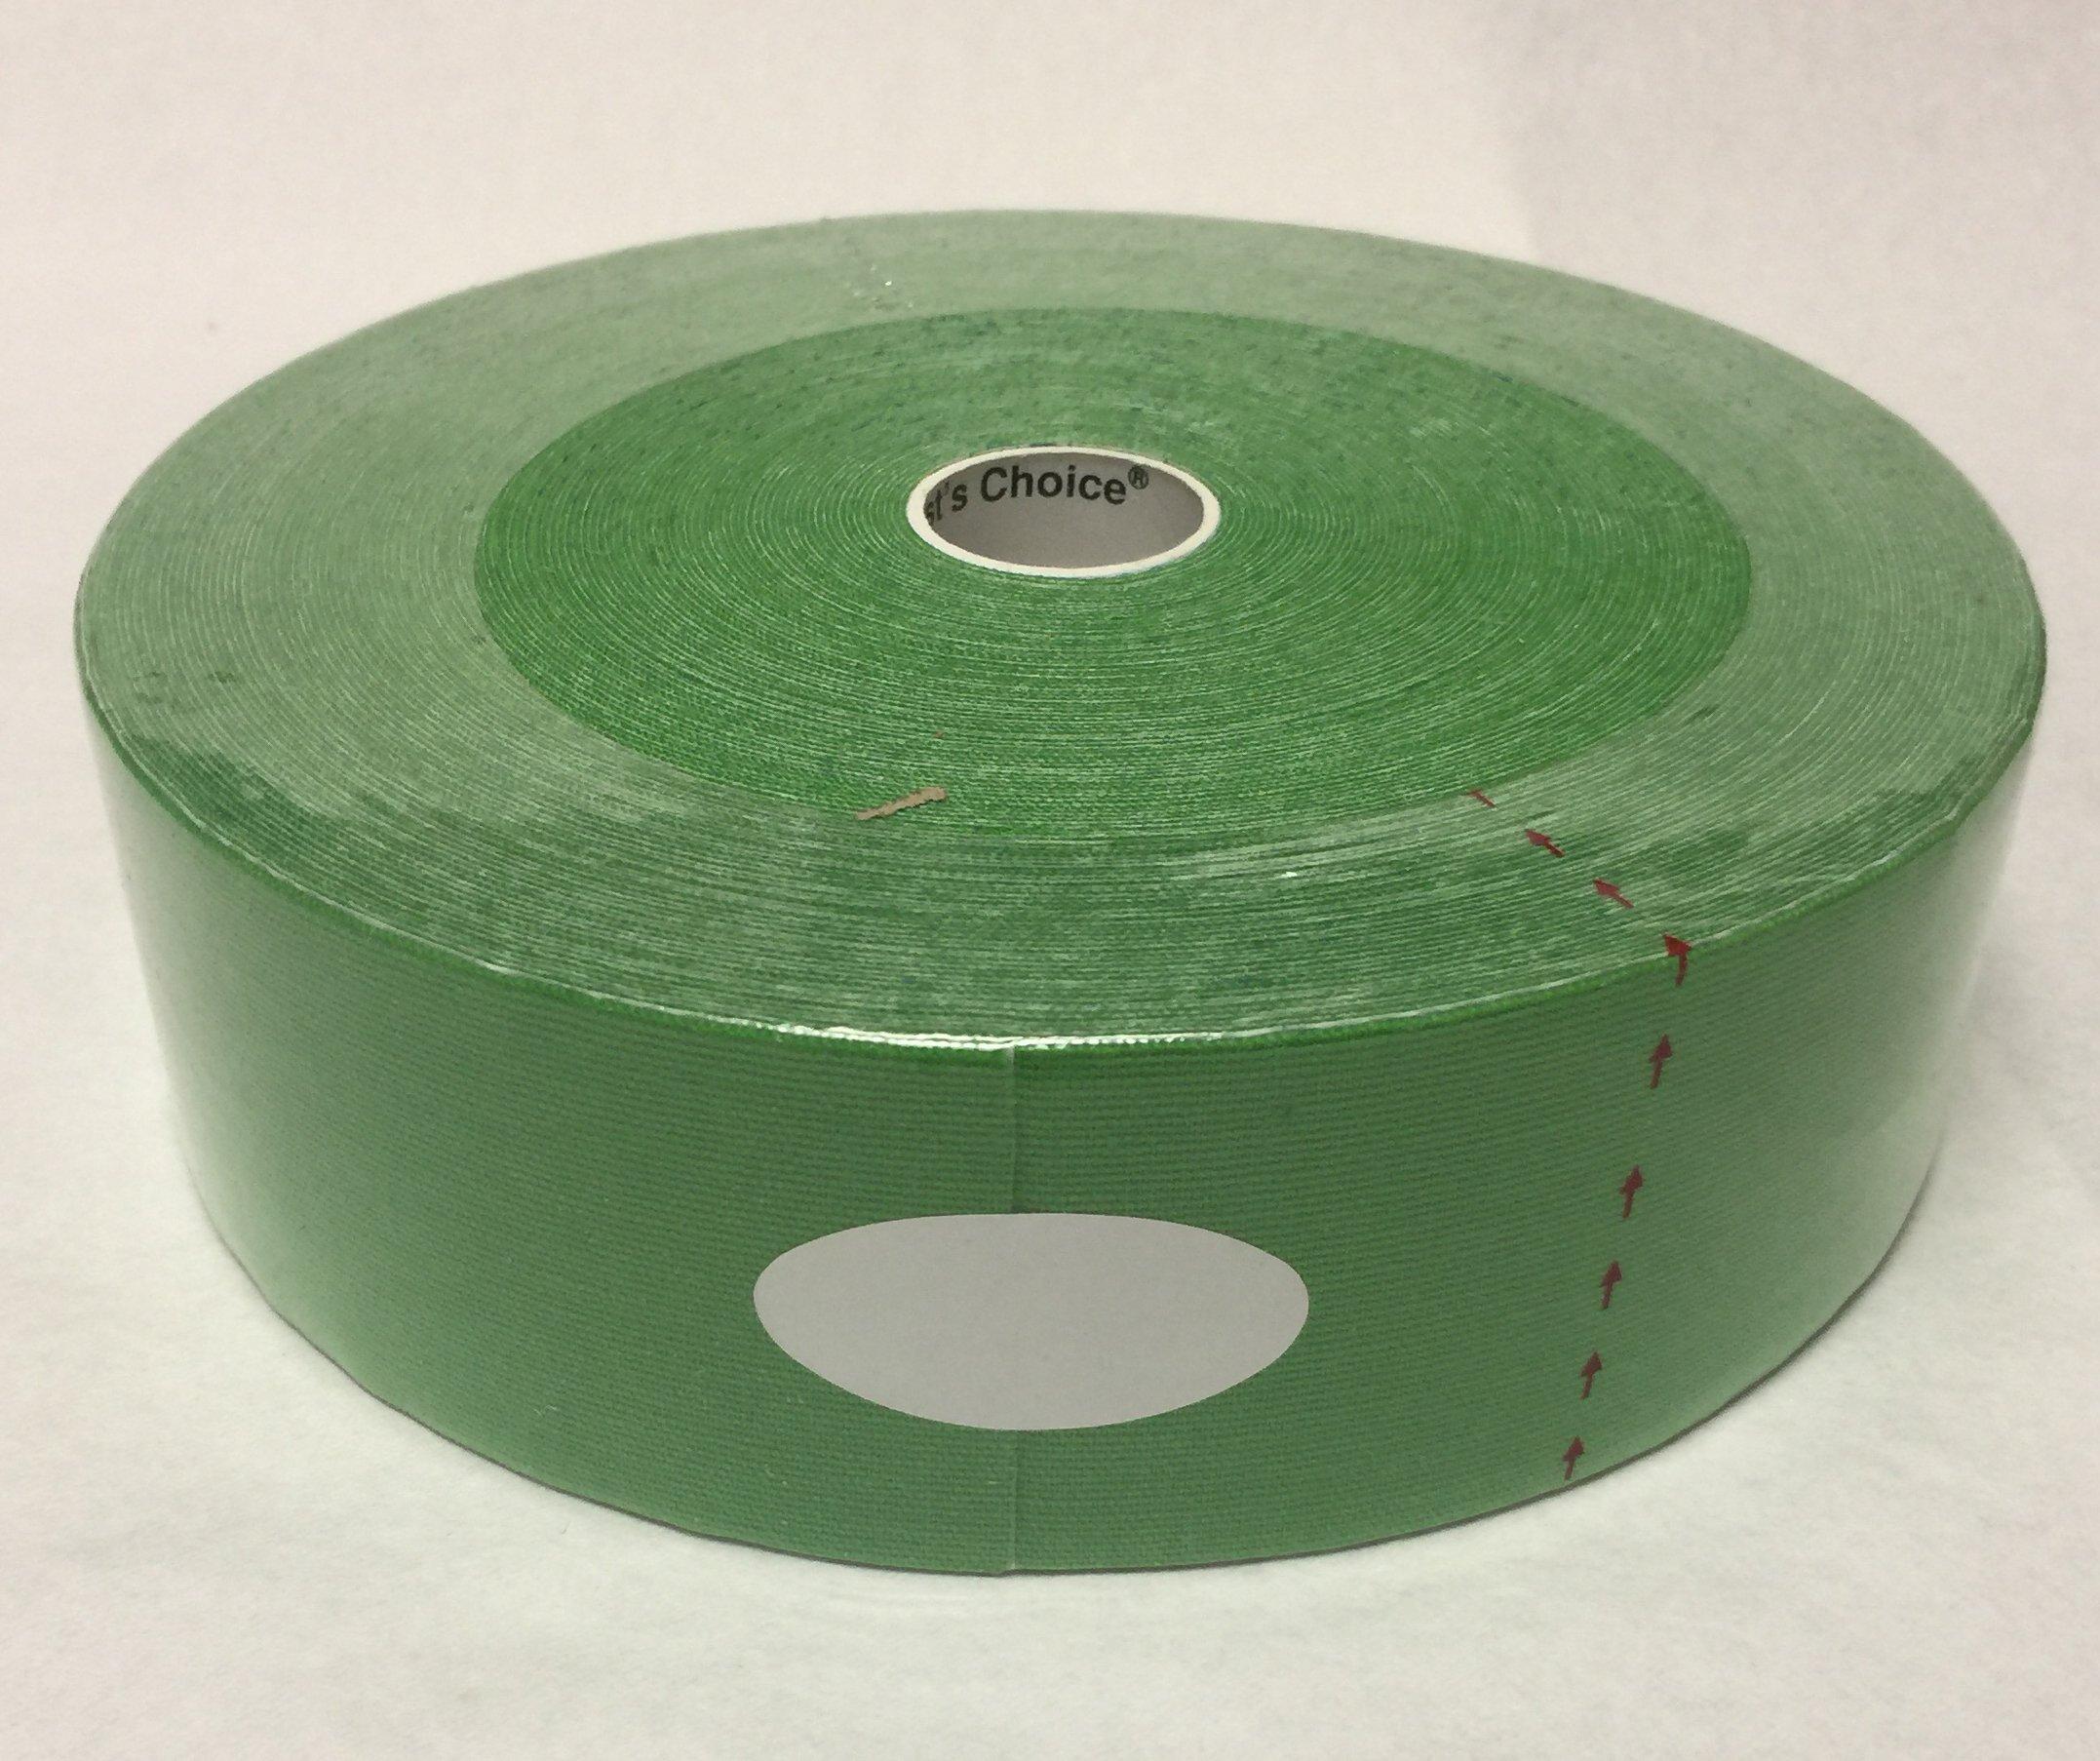 Therapist's Choice® Kinesiology Tape Bulk Roll (2-Inch x 105-Feet) (Hot Green)